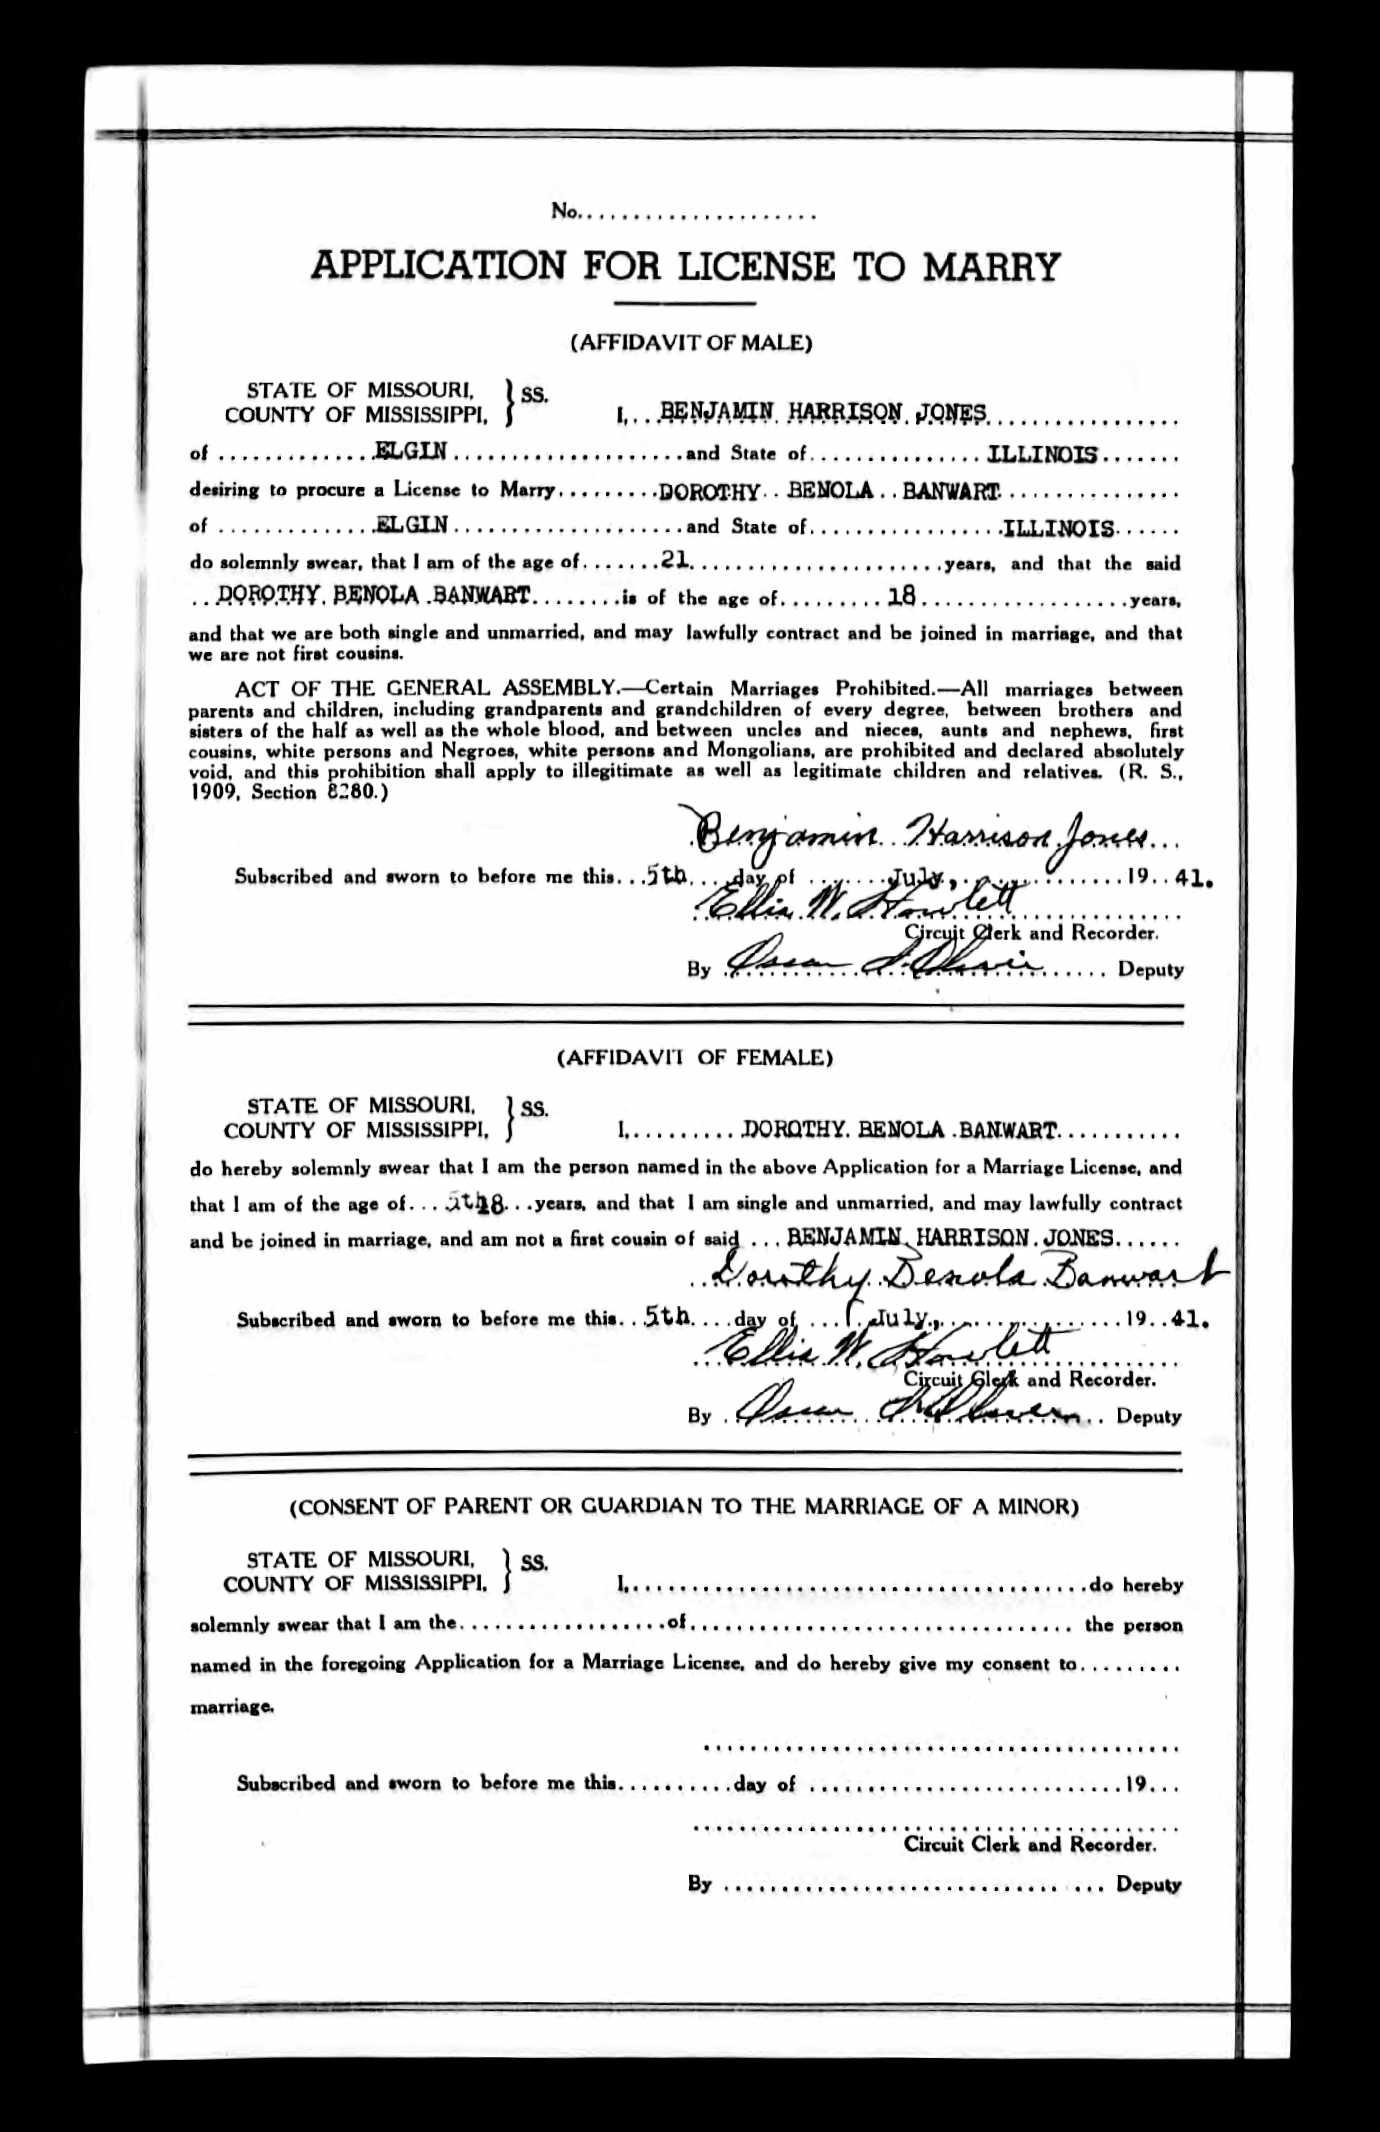 Grandma and Grandpa Jones' Marriage License.jpg